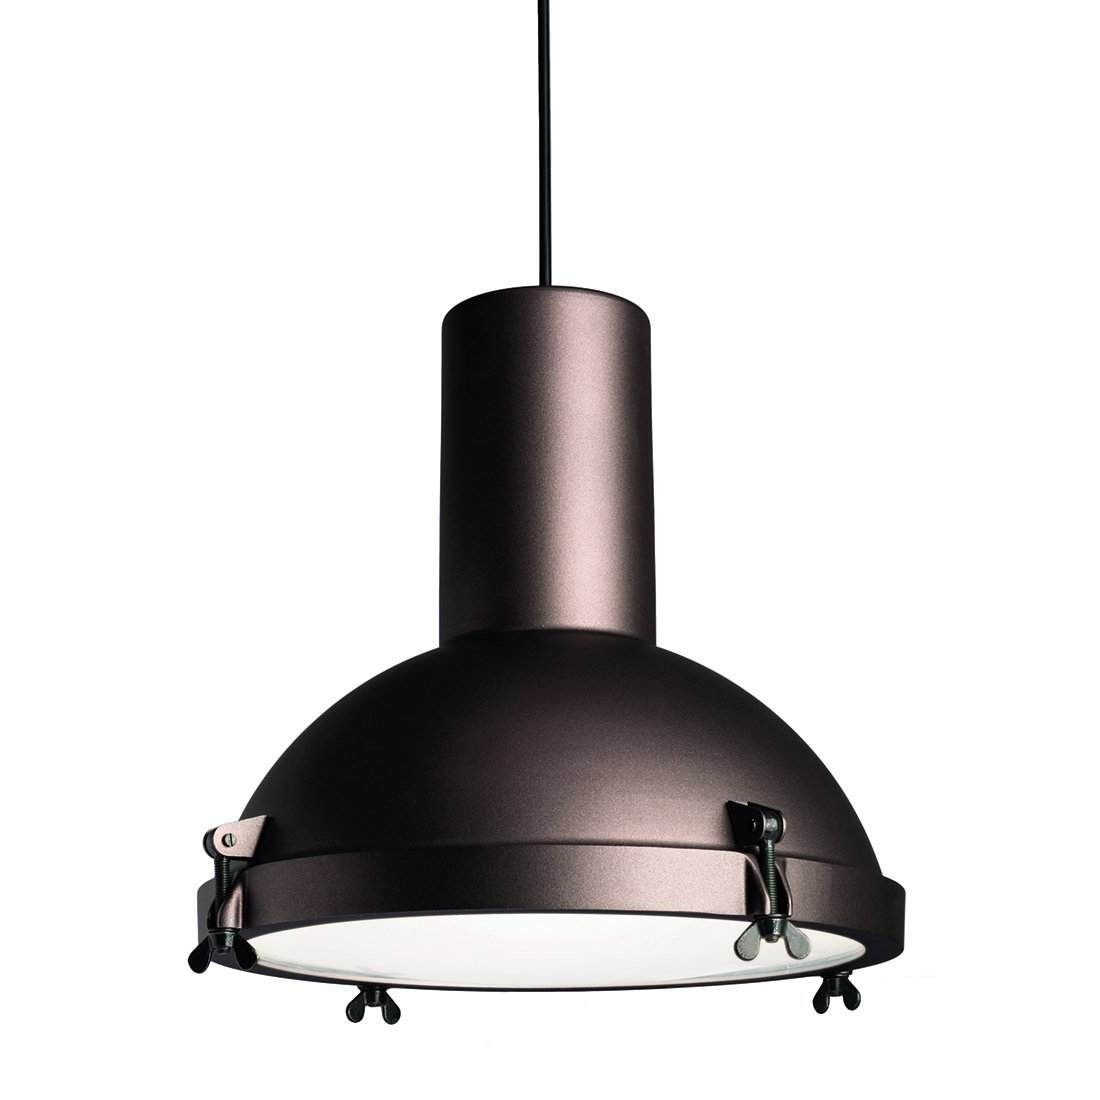 NEMO Projecteur 365 Hanglamp Moka